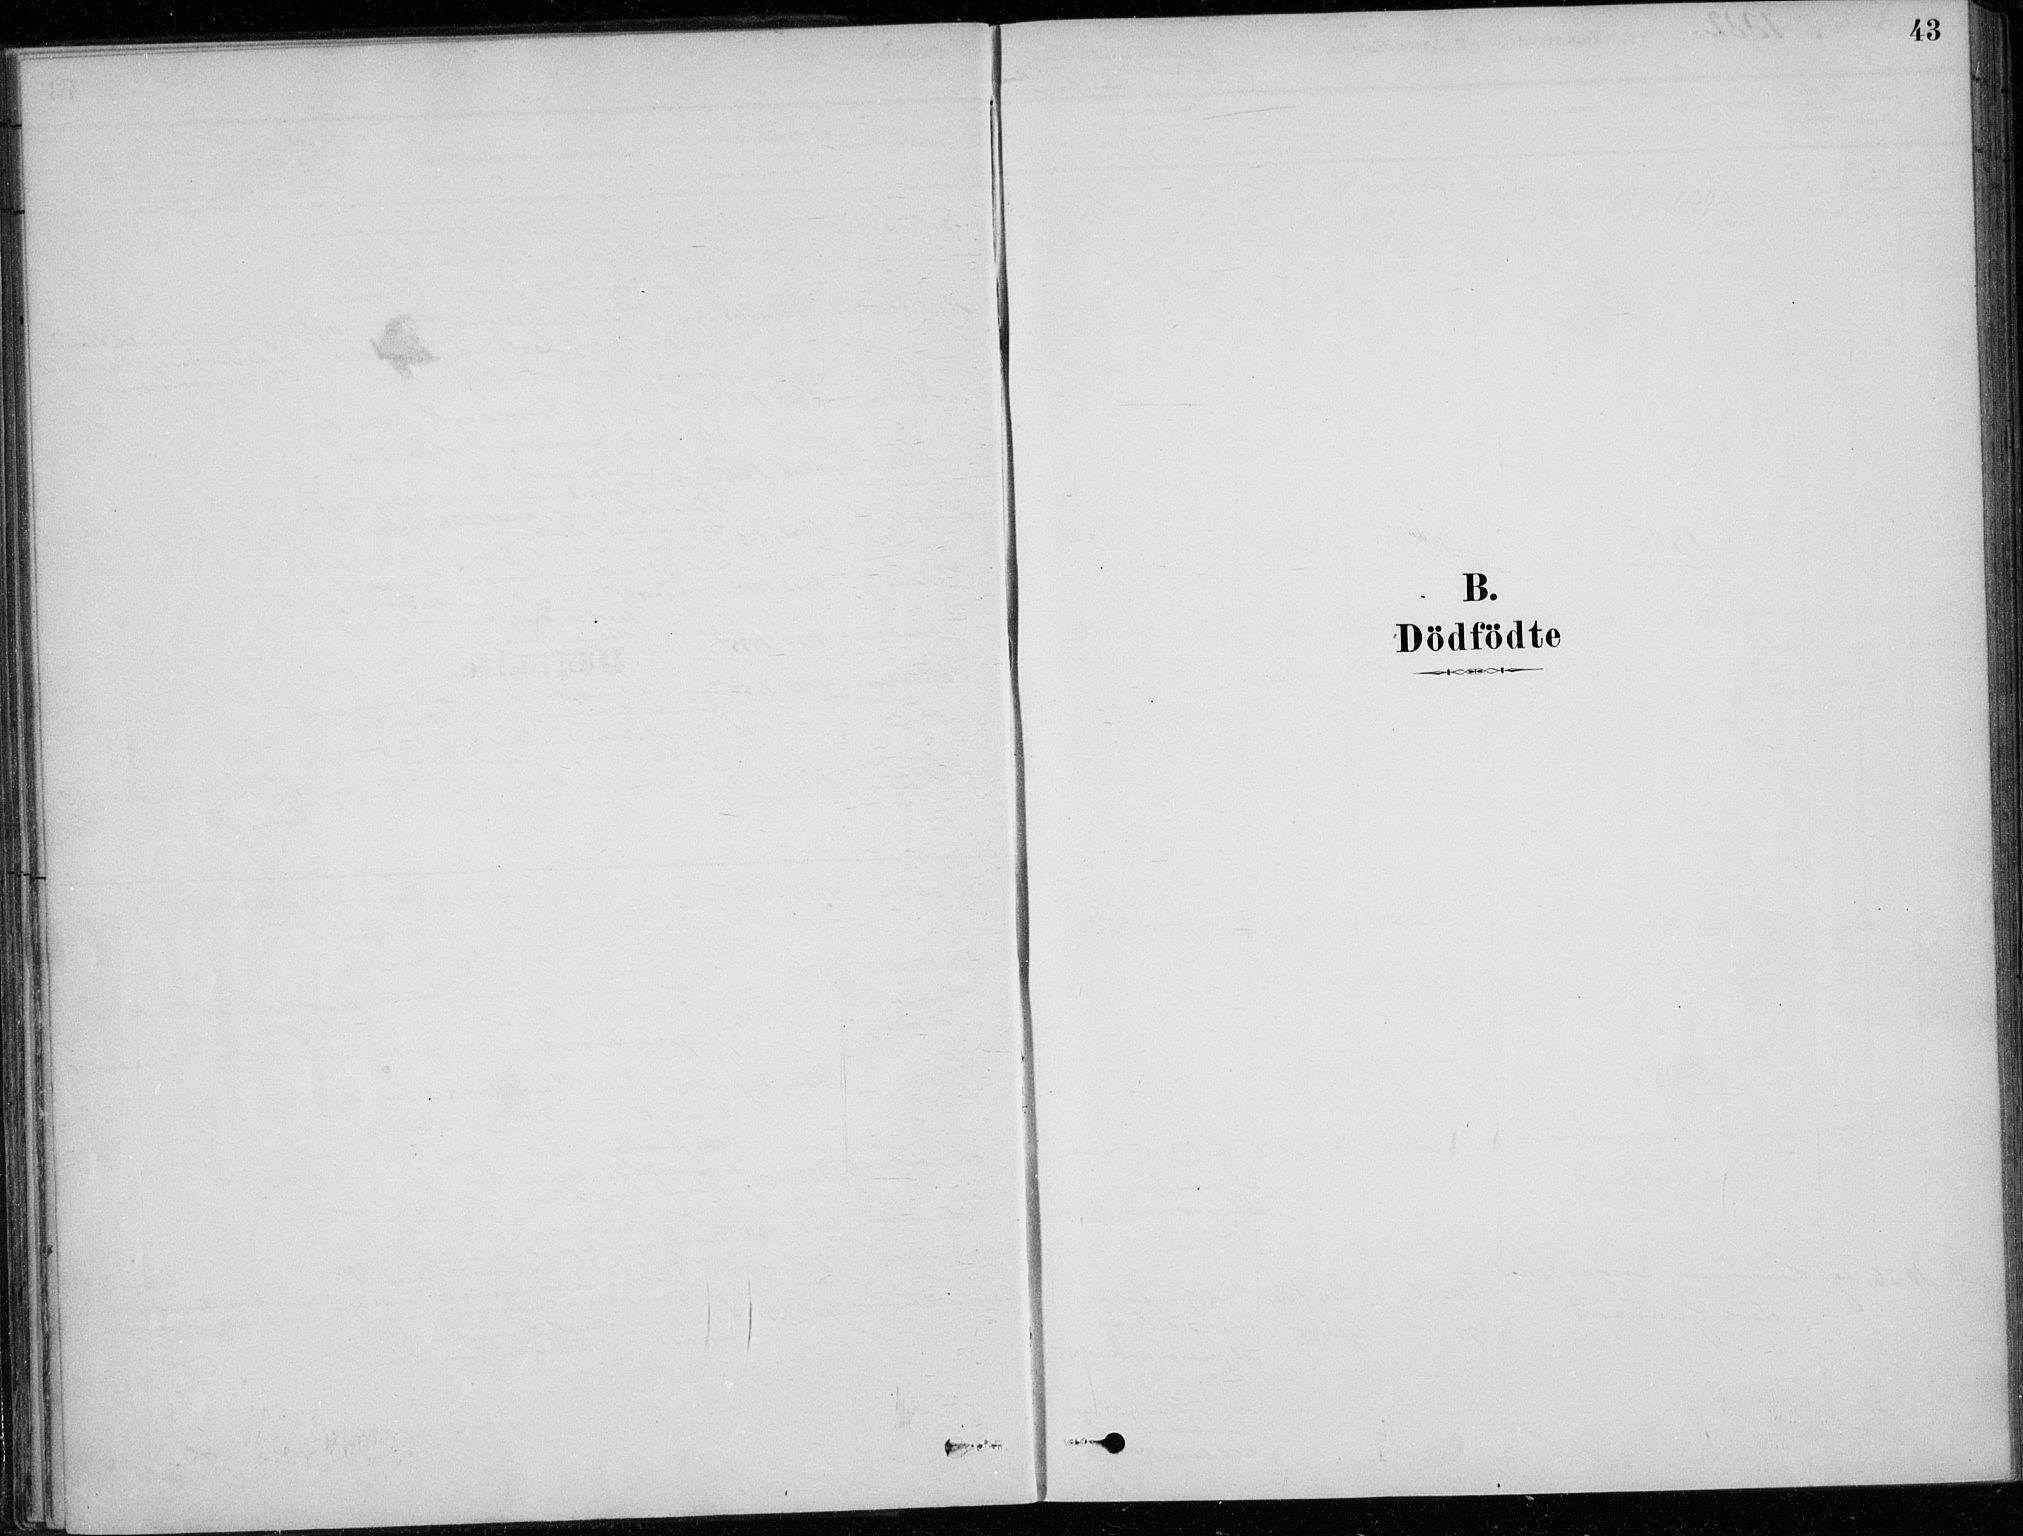 SAKO, Sigdal kirkebøker, F/Fc/L0001: Ministerialbok nr. III 1, 1879-1893, s. 43